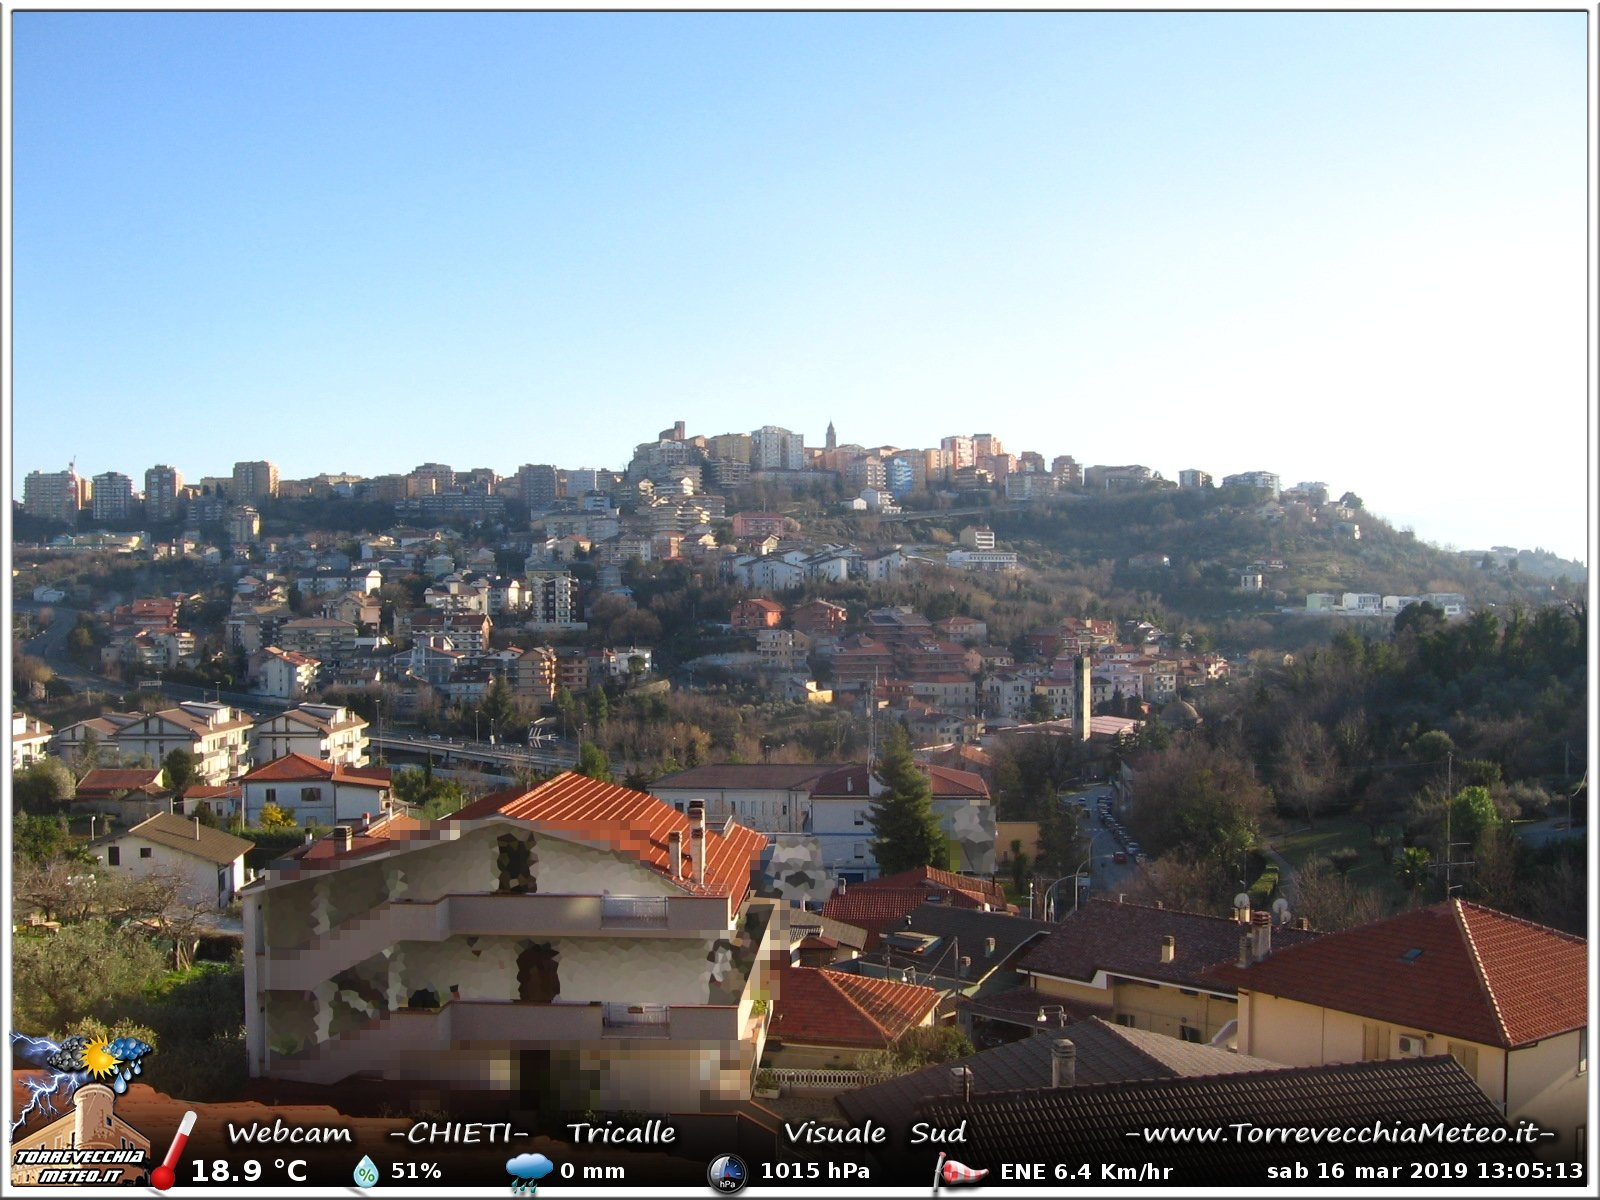 webcam Chieti